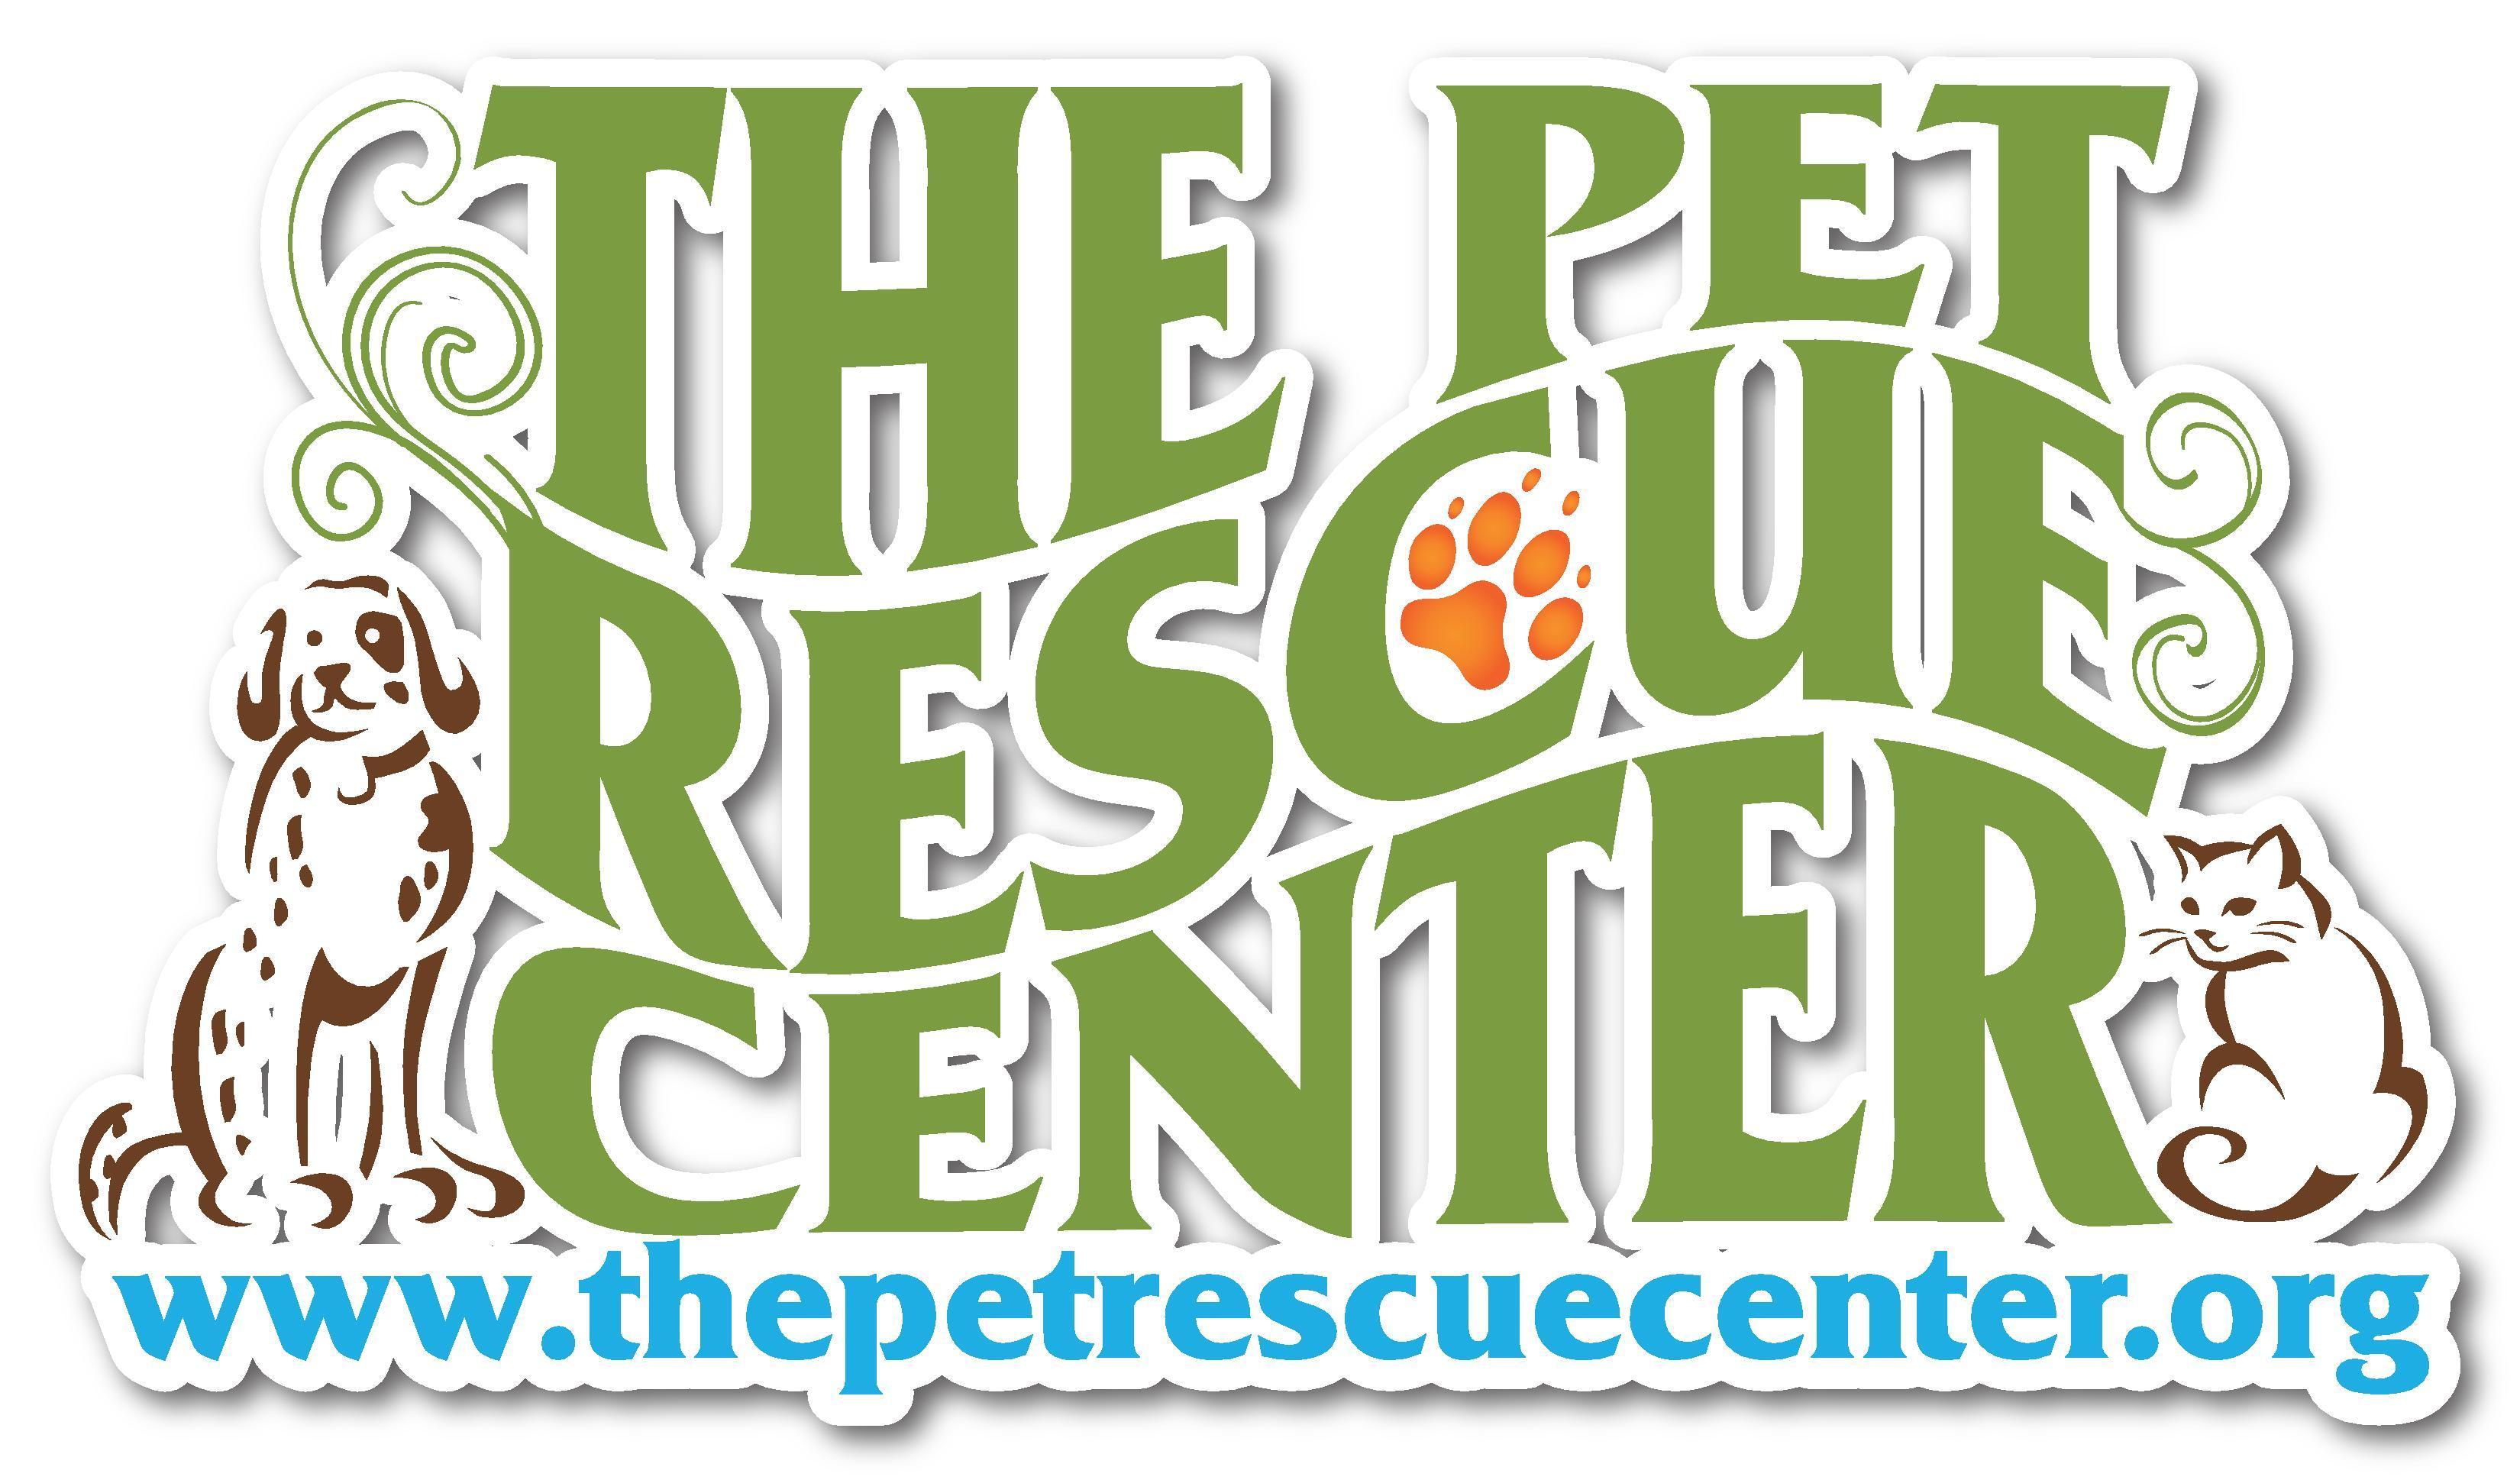 The Pet Rescue Center